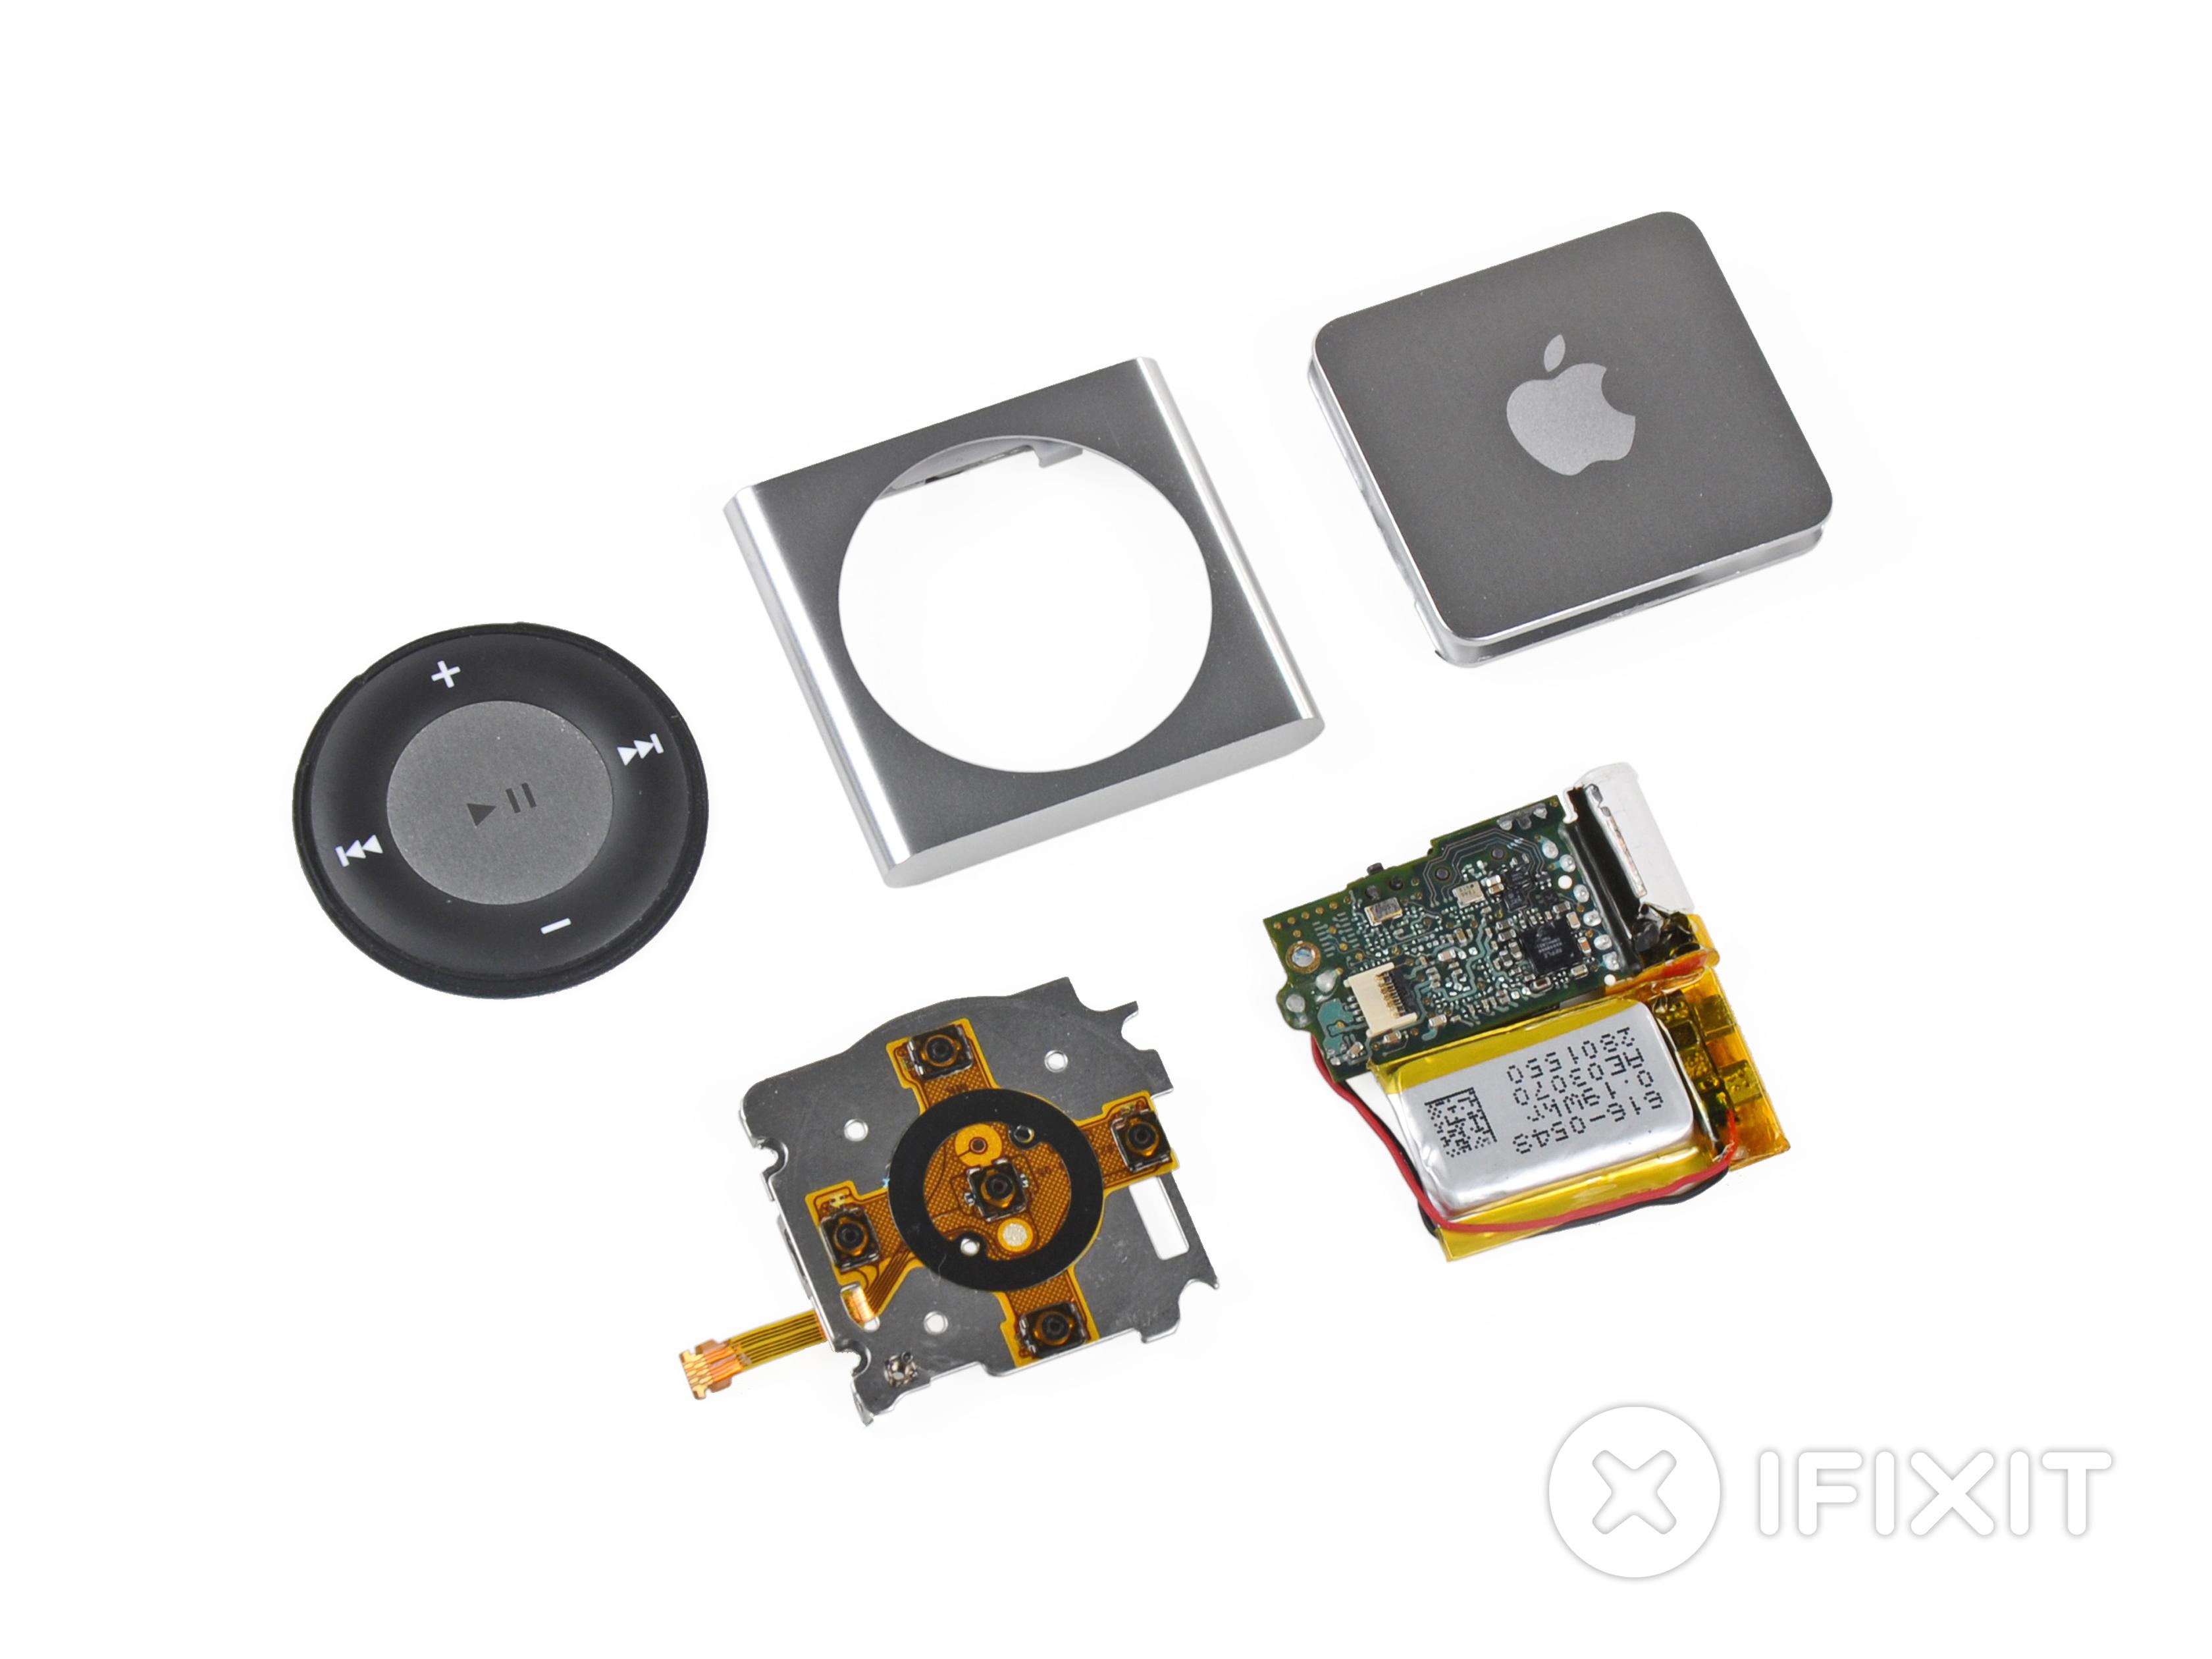 ipod shuffle 4th generation teardown ifixit rh ifixit com ipod shuffle 4ta generacion manual manual ipod shuffle 4ta generacion 2gb